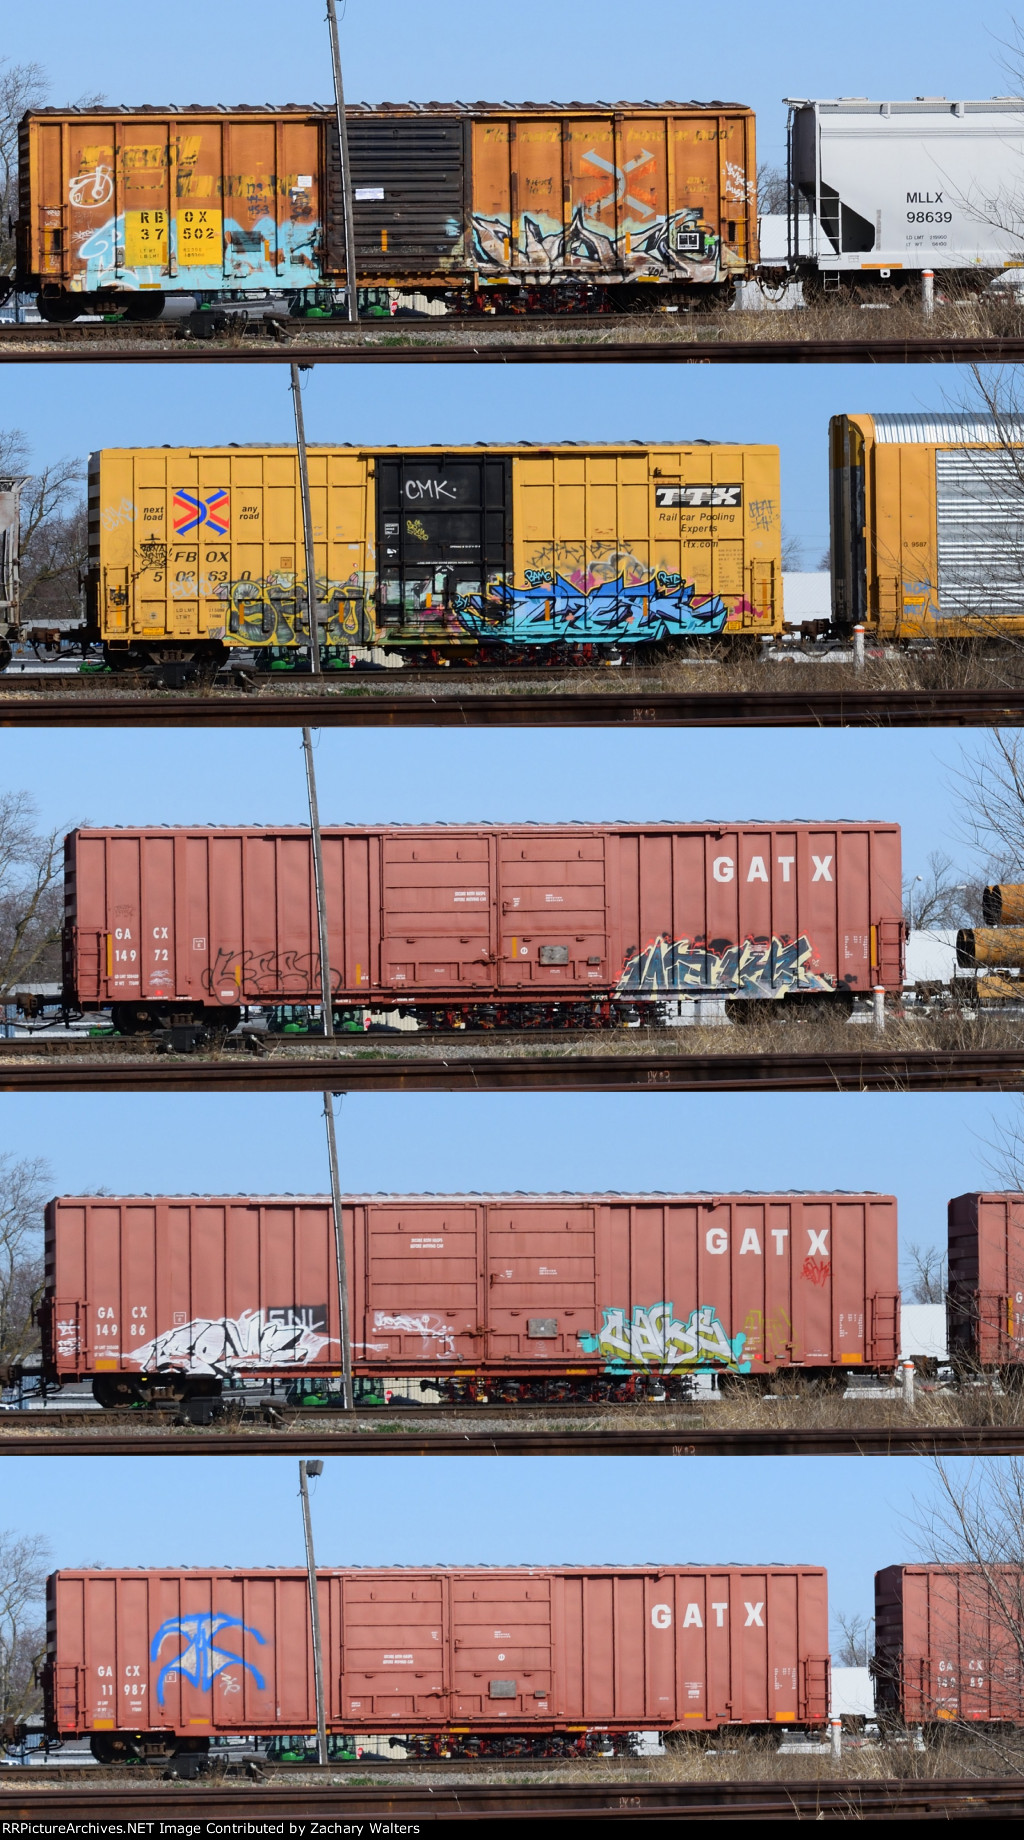 RBOX FBOX GACX Boxcars